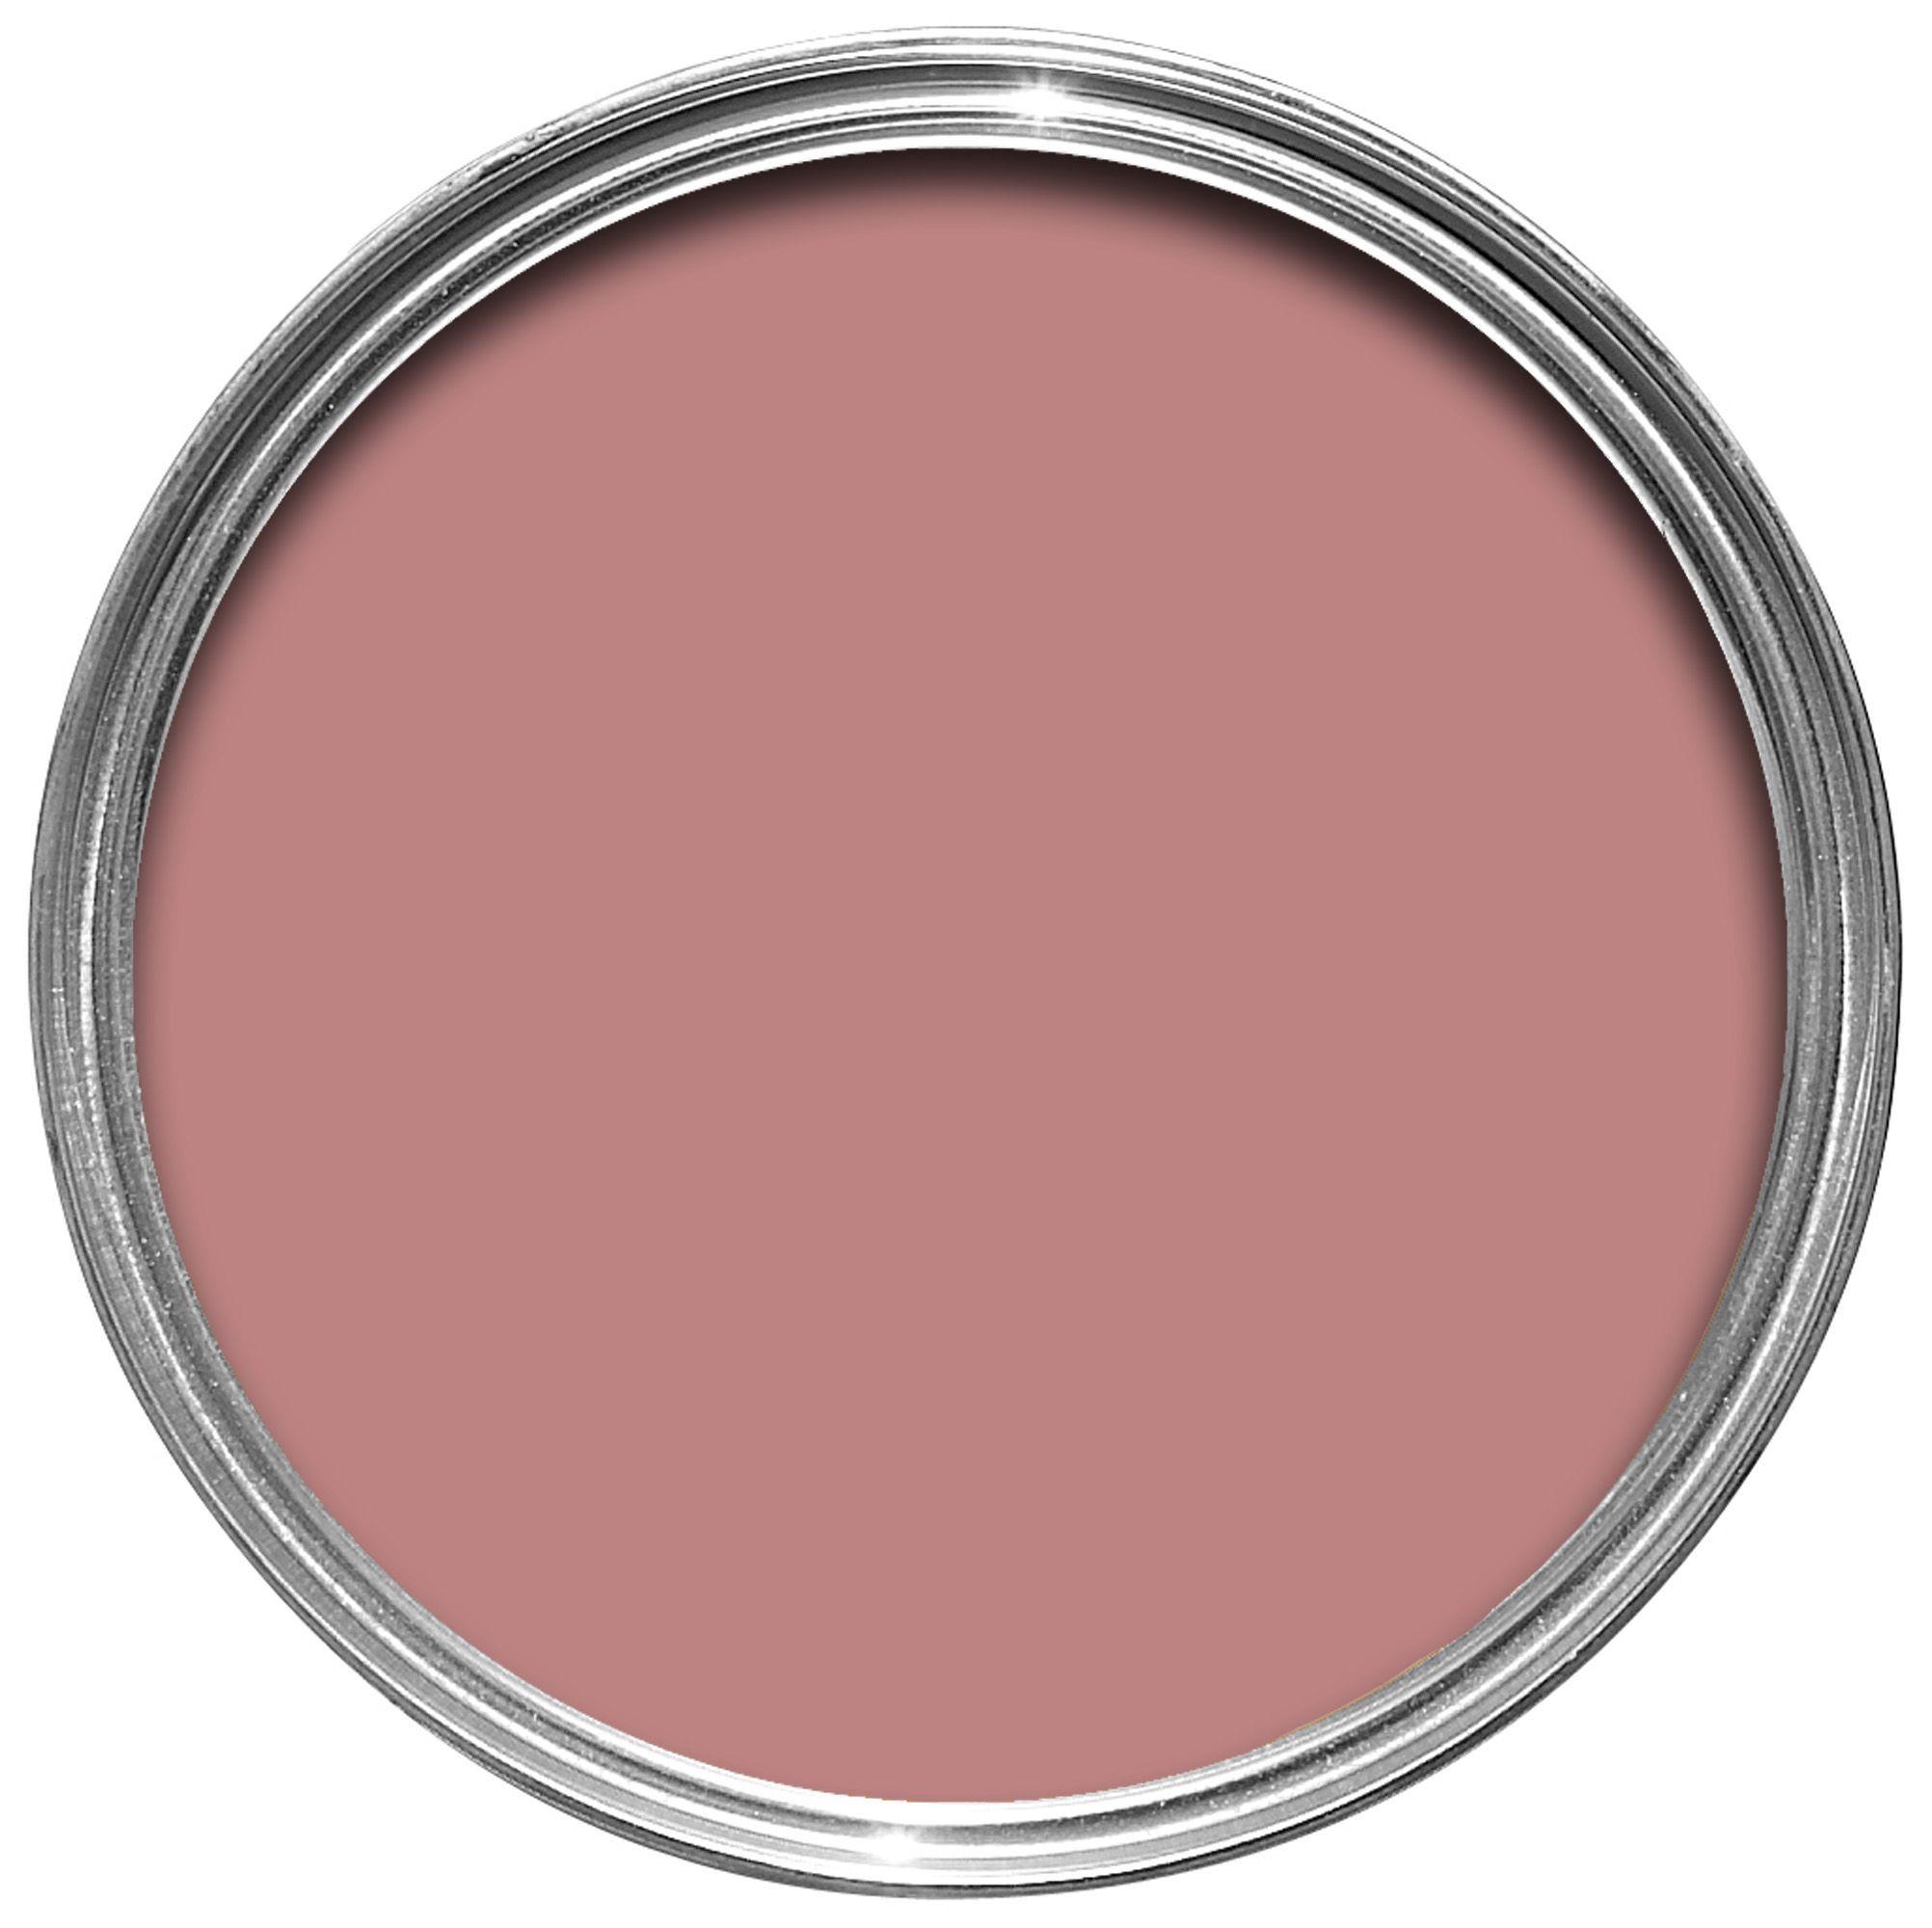 Rust Oleum Dusky Pink Chalky Matt Furniture Paint